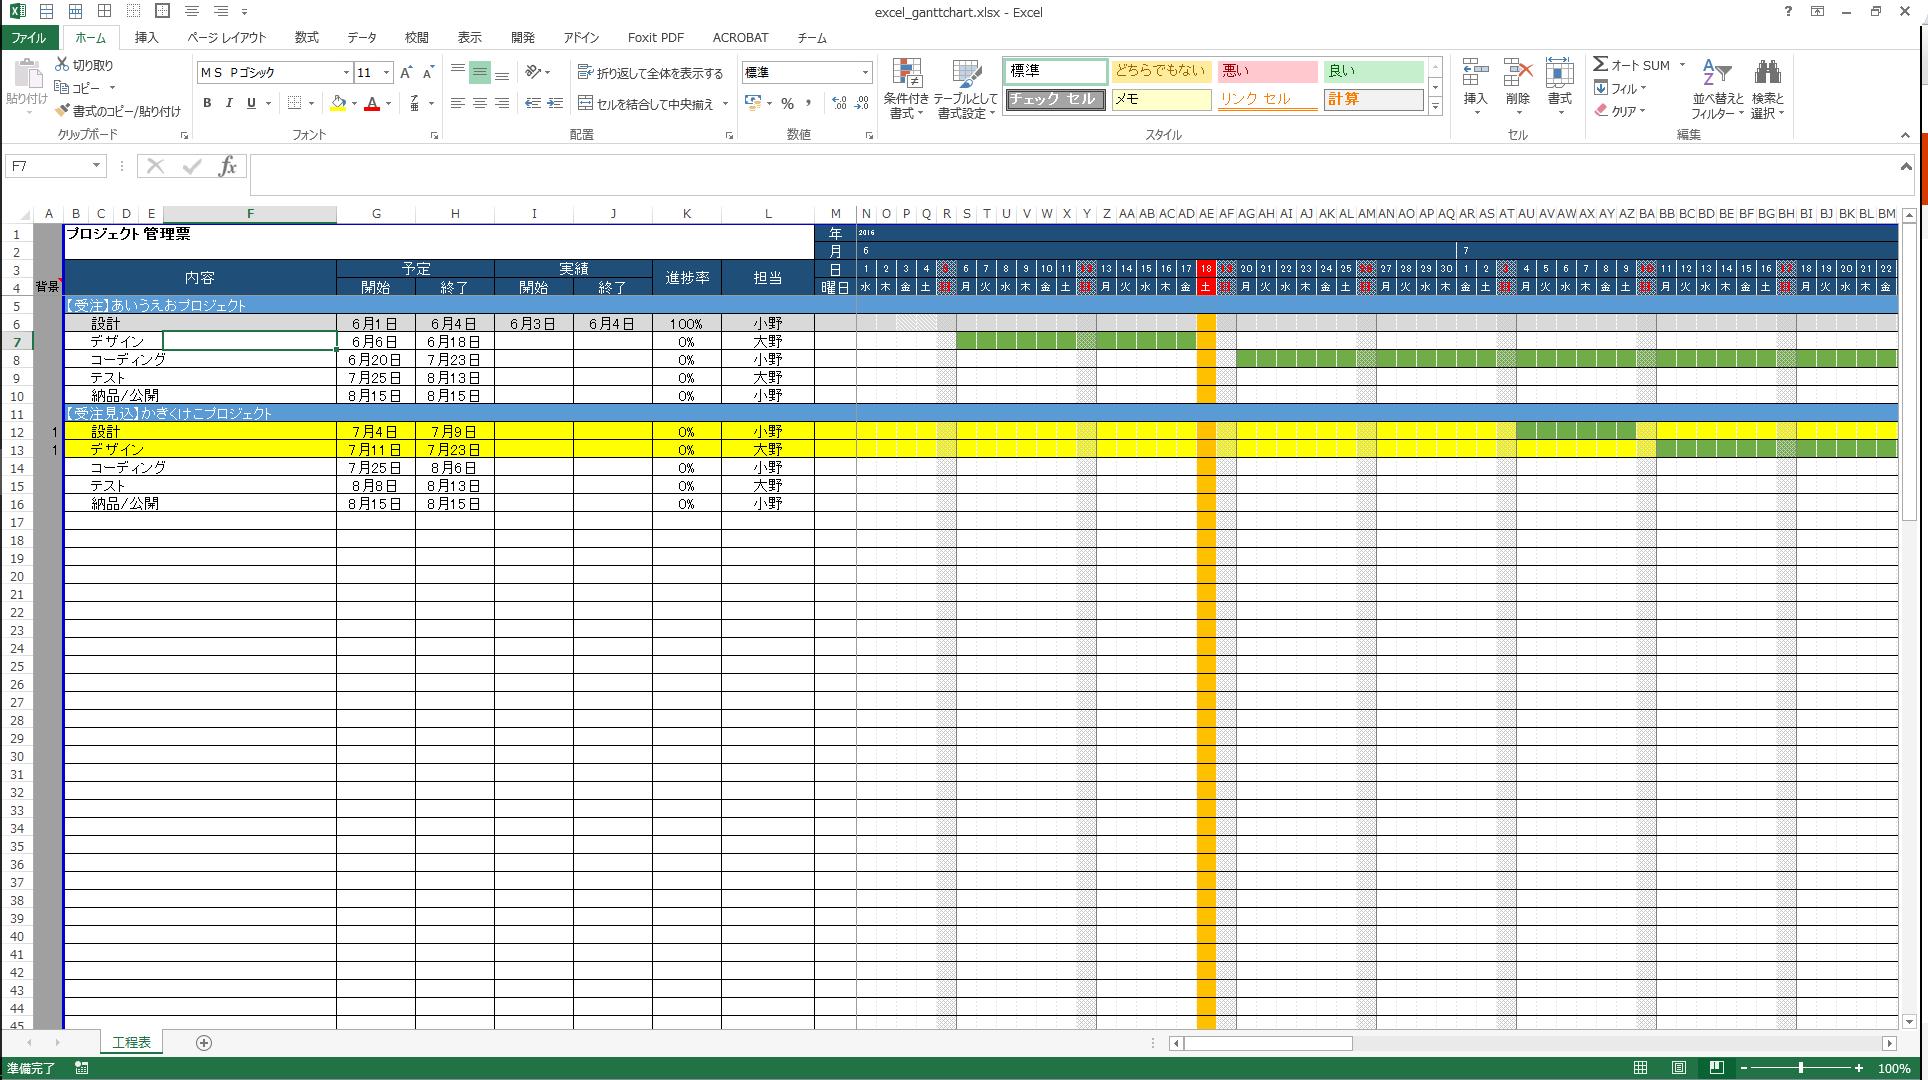 office excelでプロジェクト管理 工程 実績管理 スケジュール管理